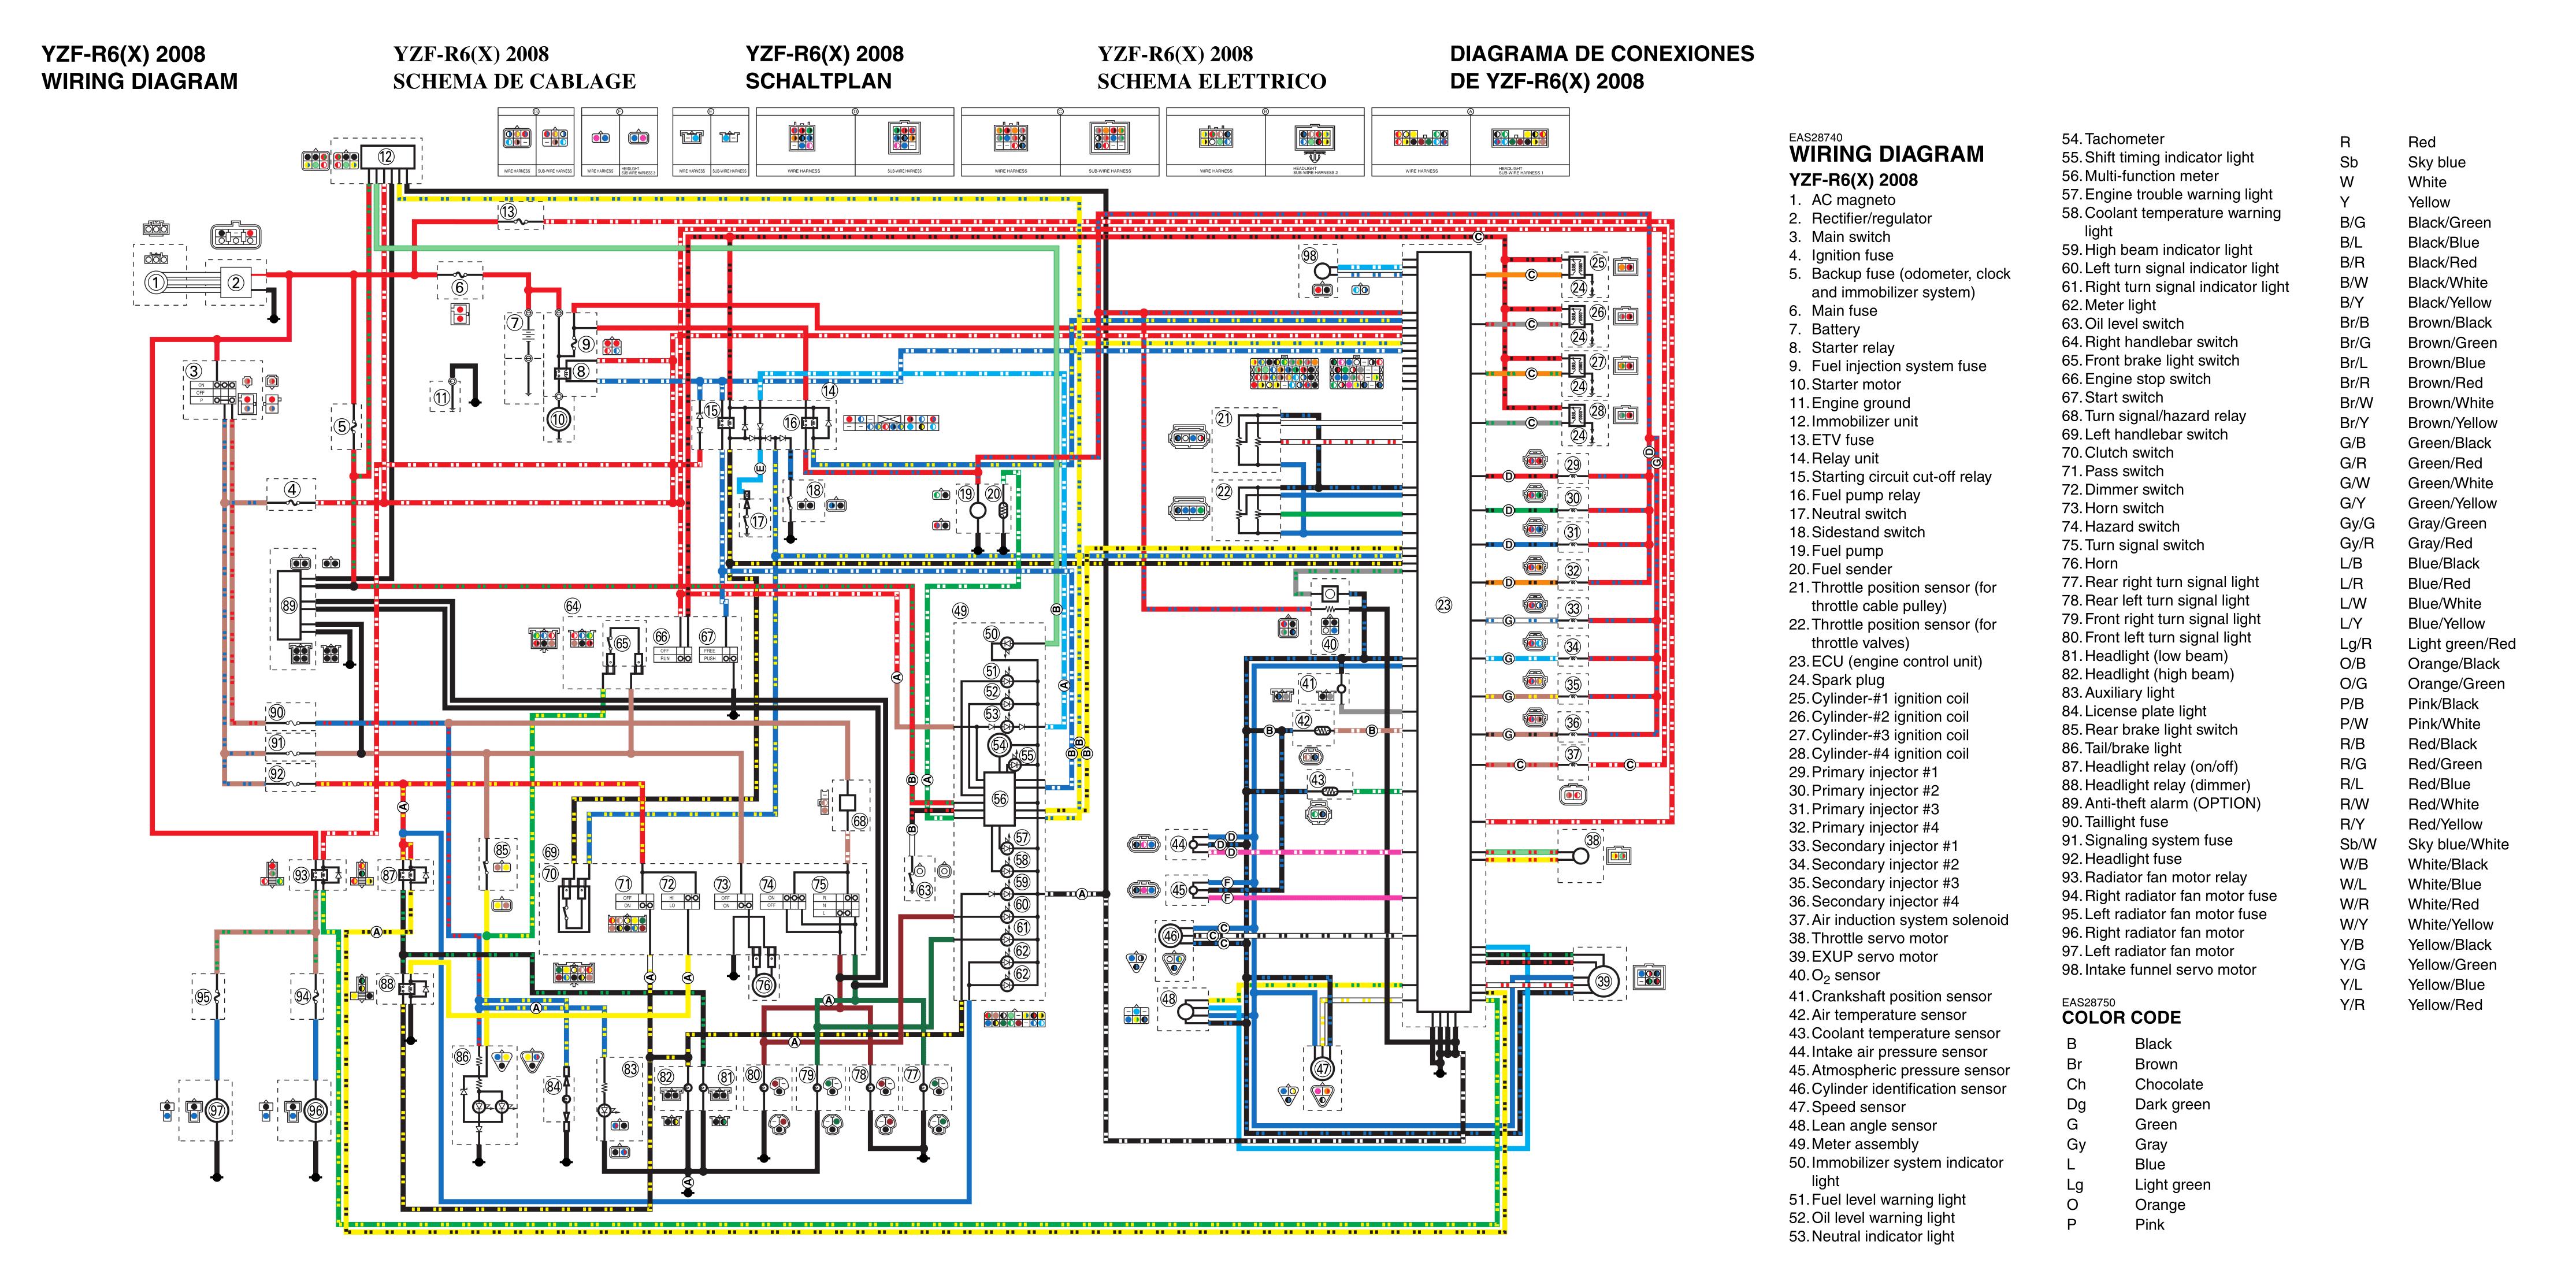 2008 Zx10r Wiring Diagram Auto Electrical 13048 Wire Delco Alternator Diagrams